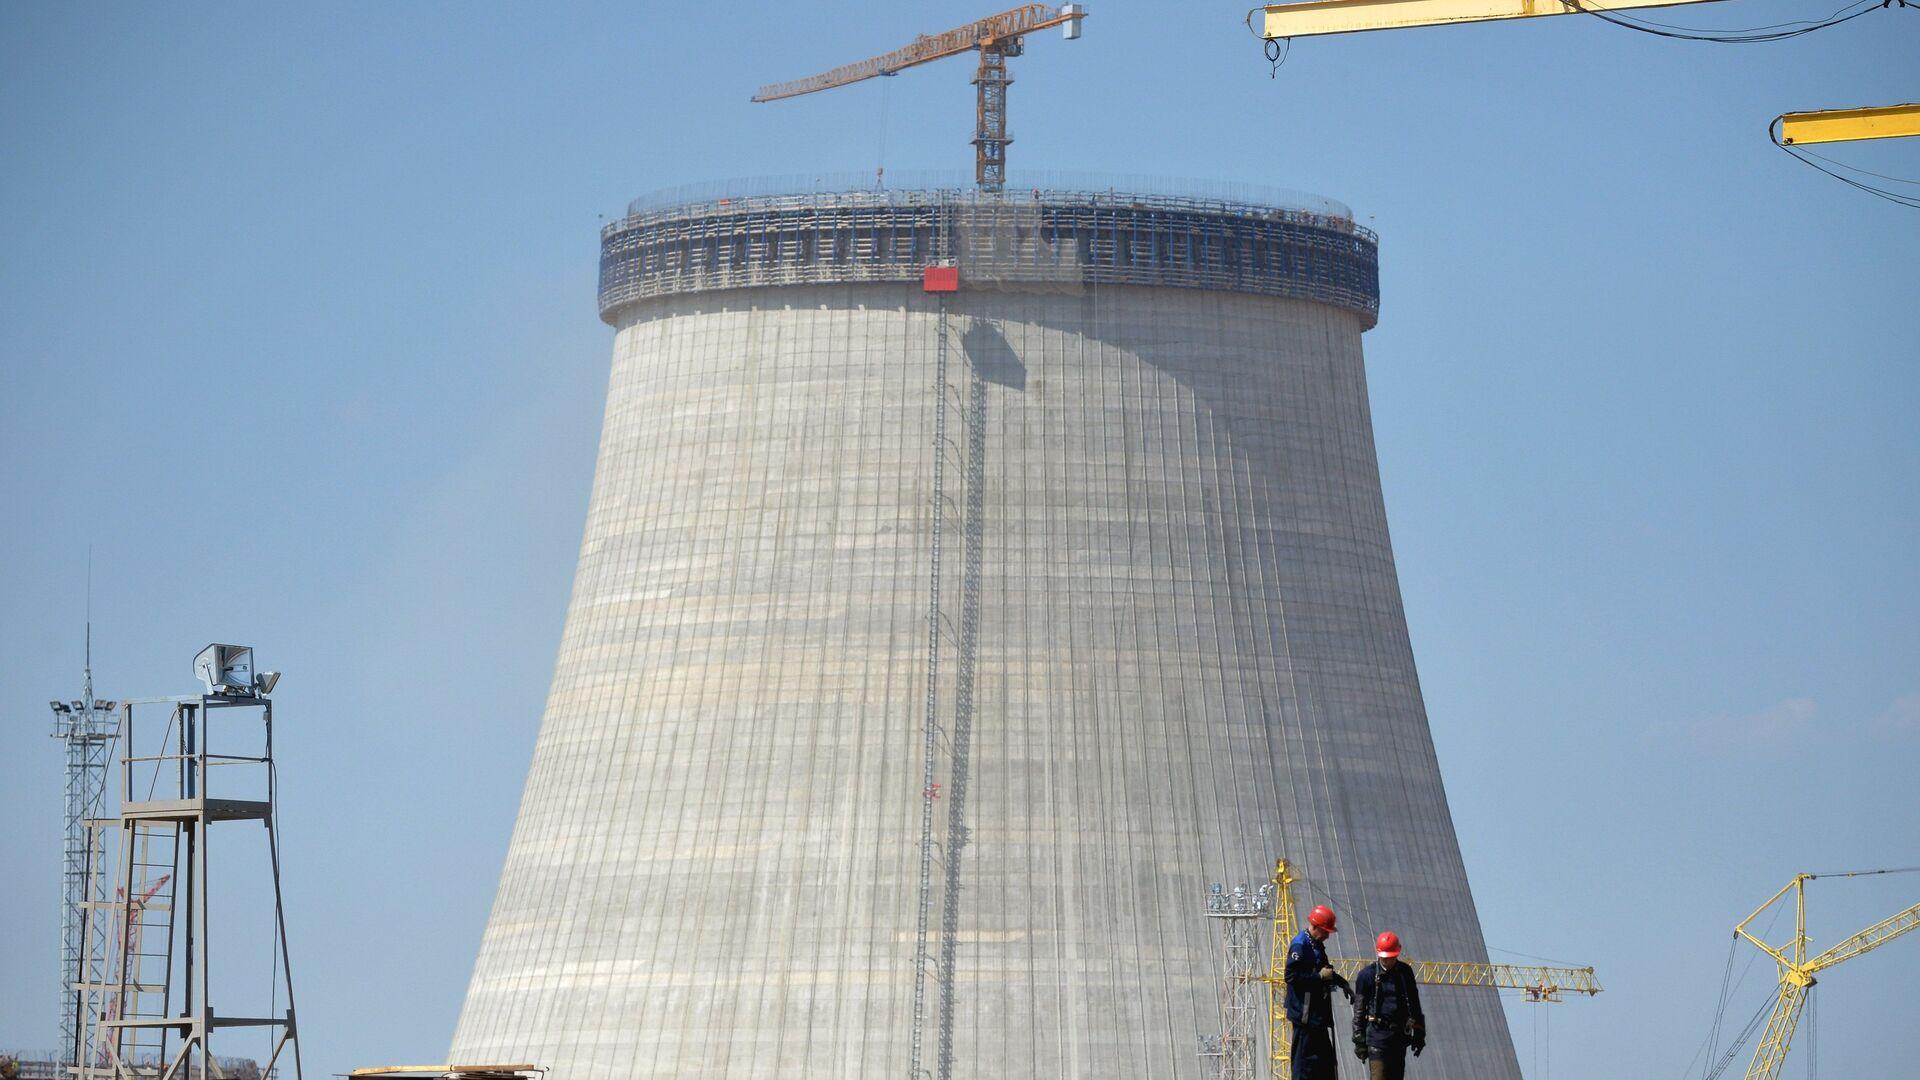 Сentral nuclear en Bielorrusia - Sputnik Mundo, 1920, 12.07.2021